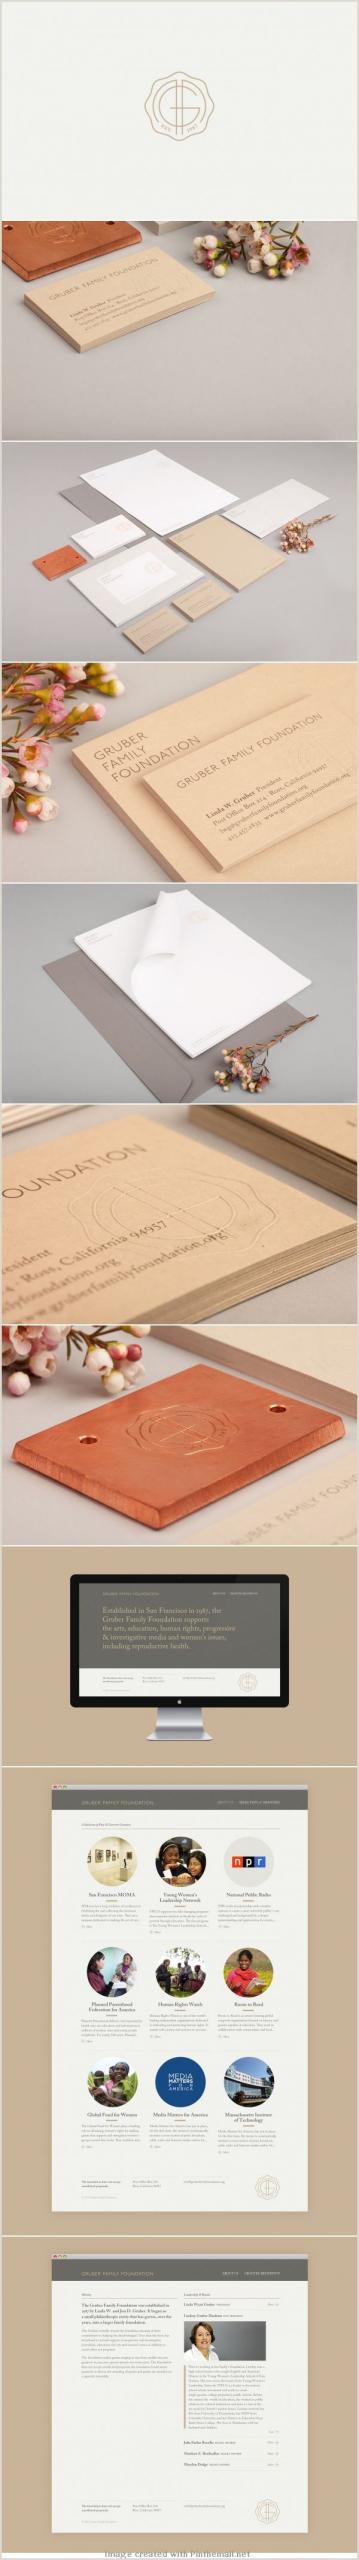 Best Website To Make Business Cards 14 Popular Hardwood Flooring Business Card Template